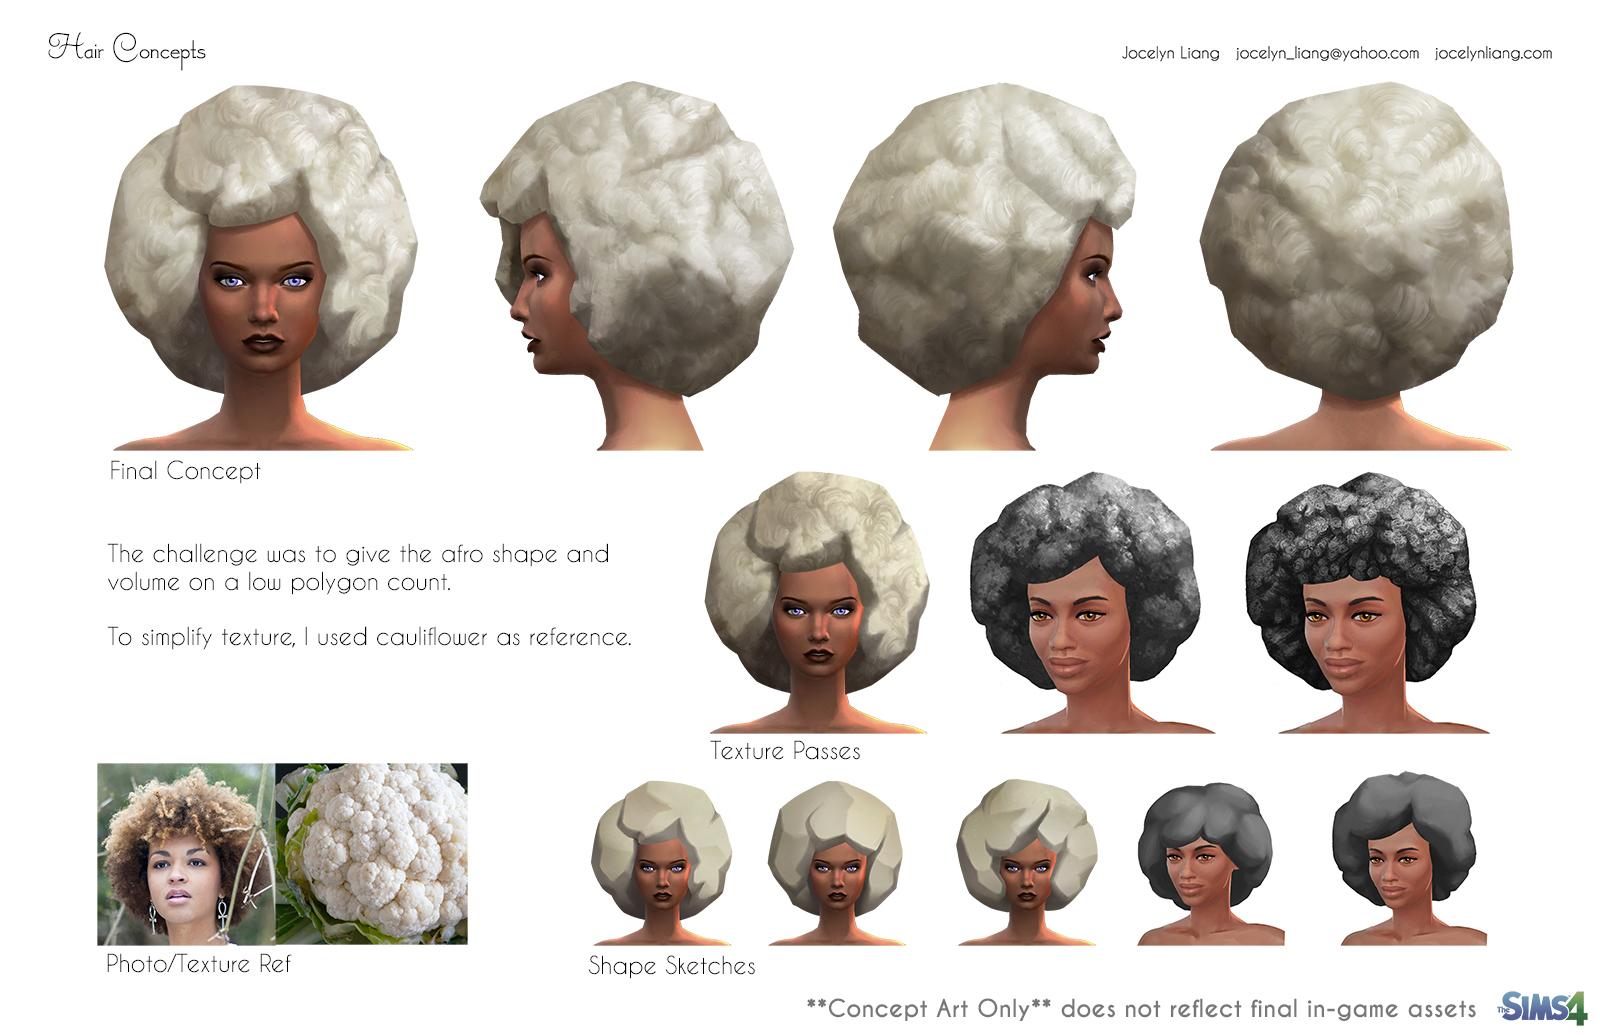 Sims 4 Game Art by Jocelyn Liang